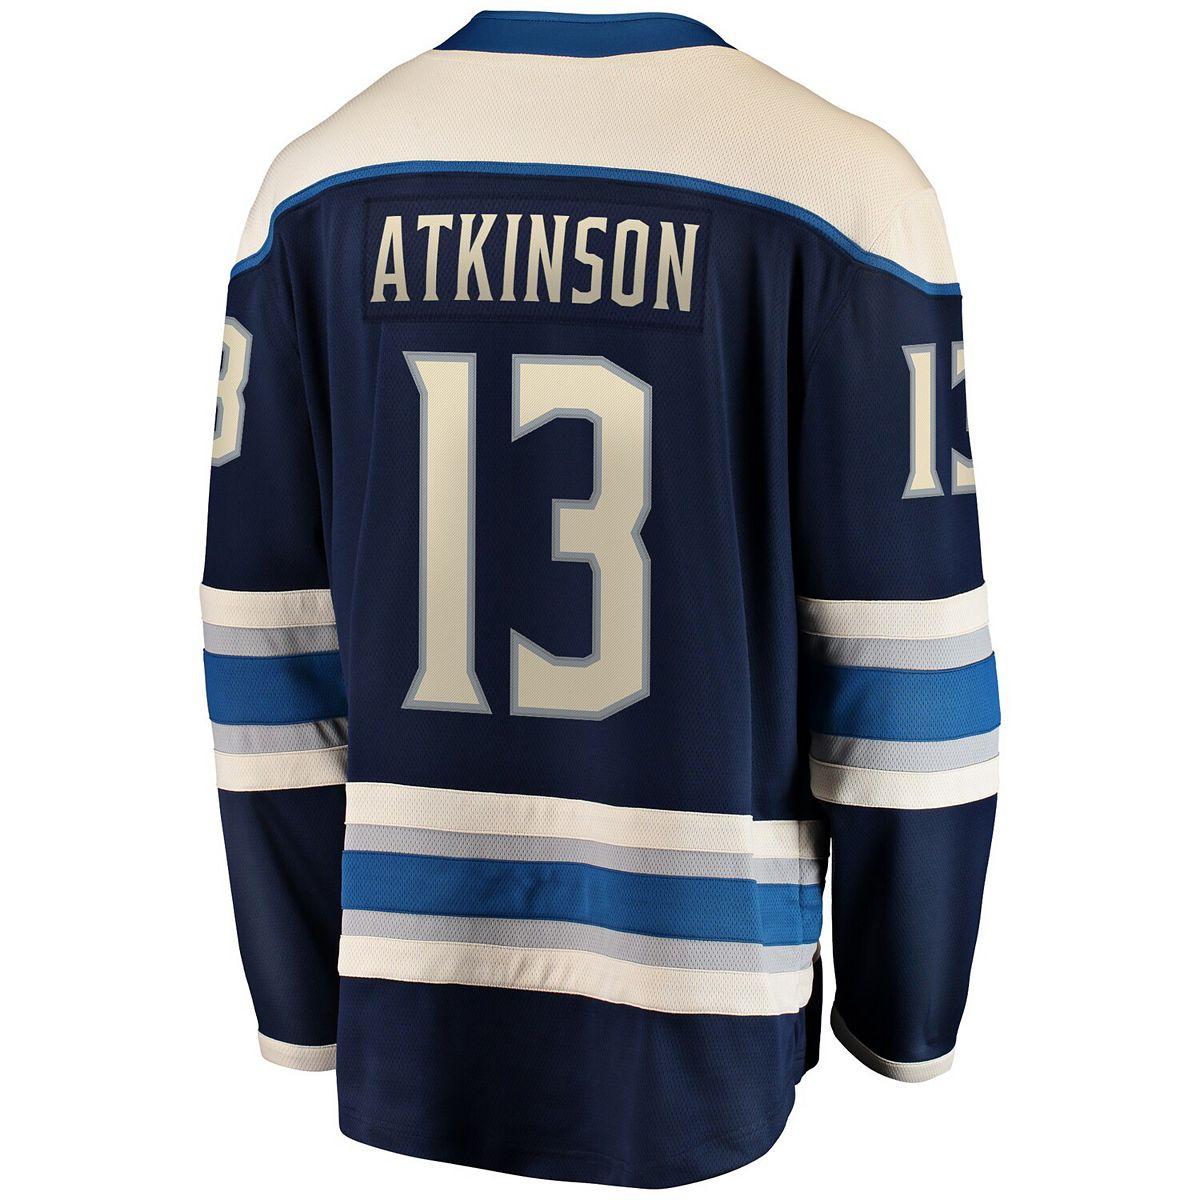 Men's Fanatics Branded Cam Atkinson Navy Columbus Blue Jackets Alternate Premier Breakaway Player Jersey 6NAlC